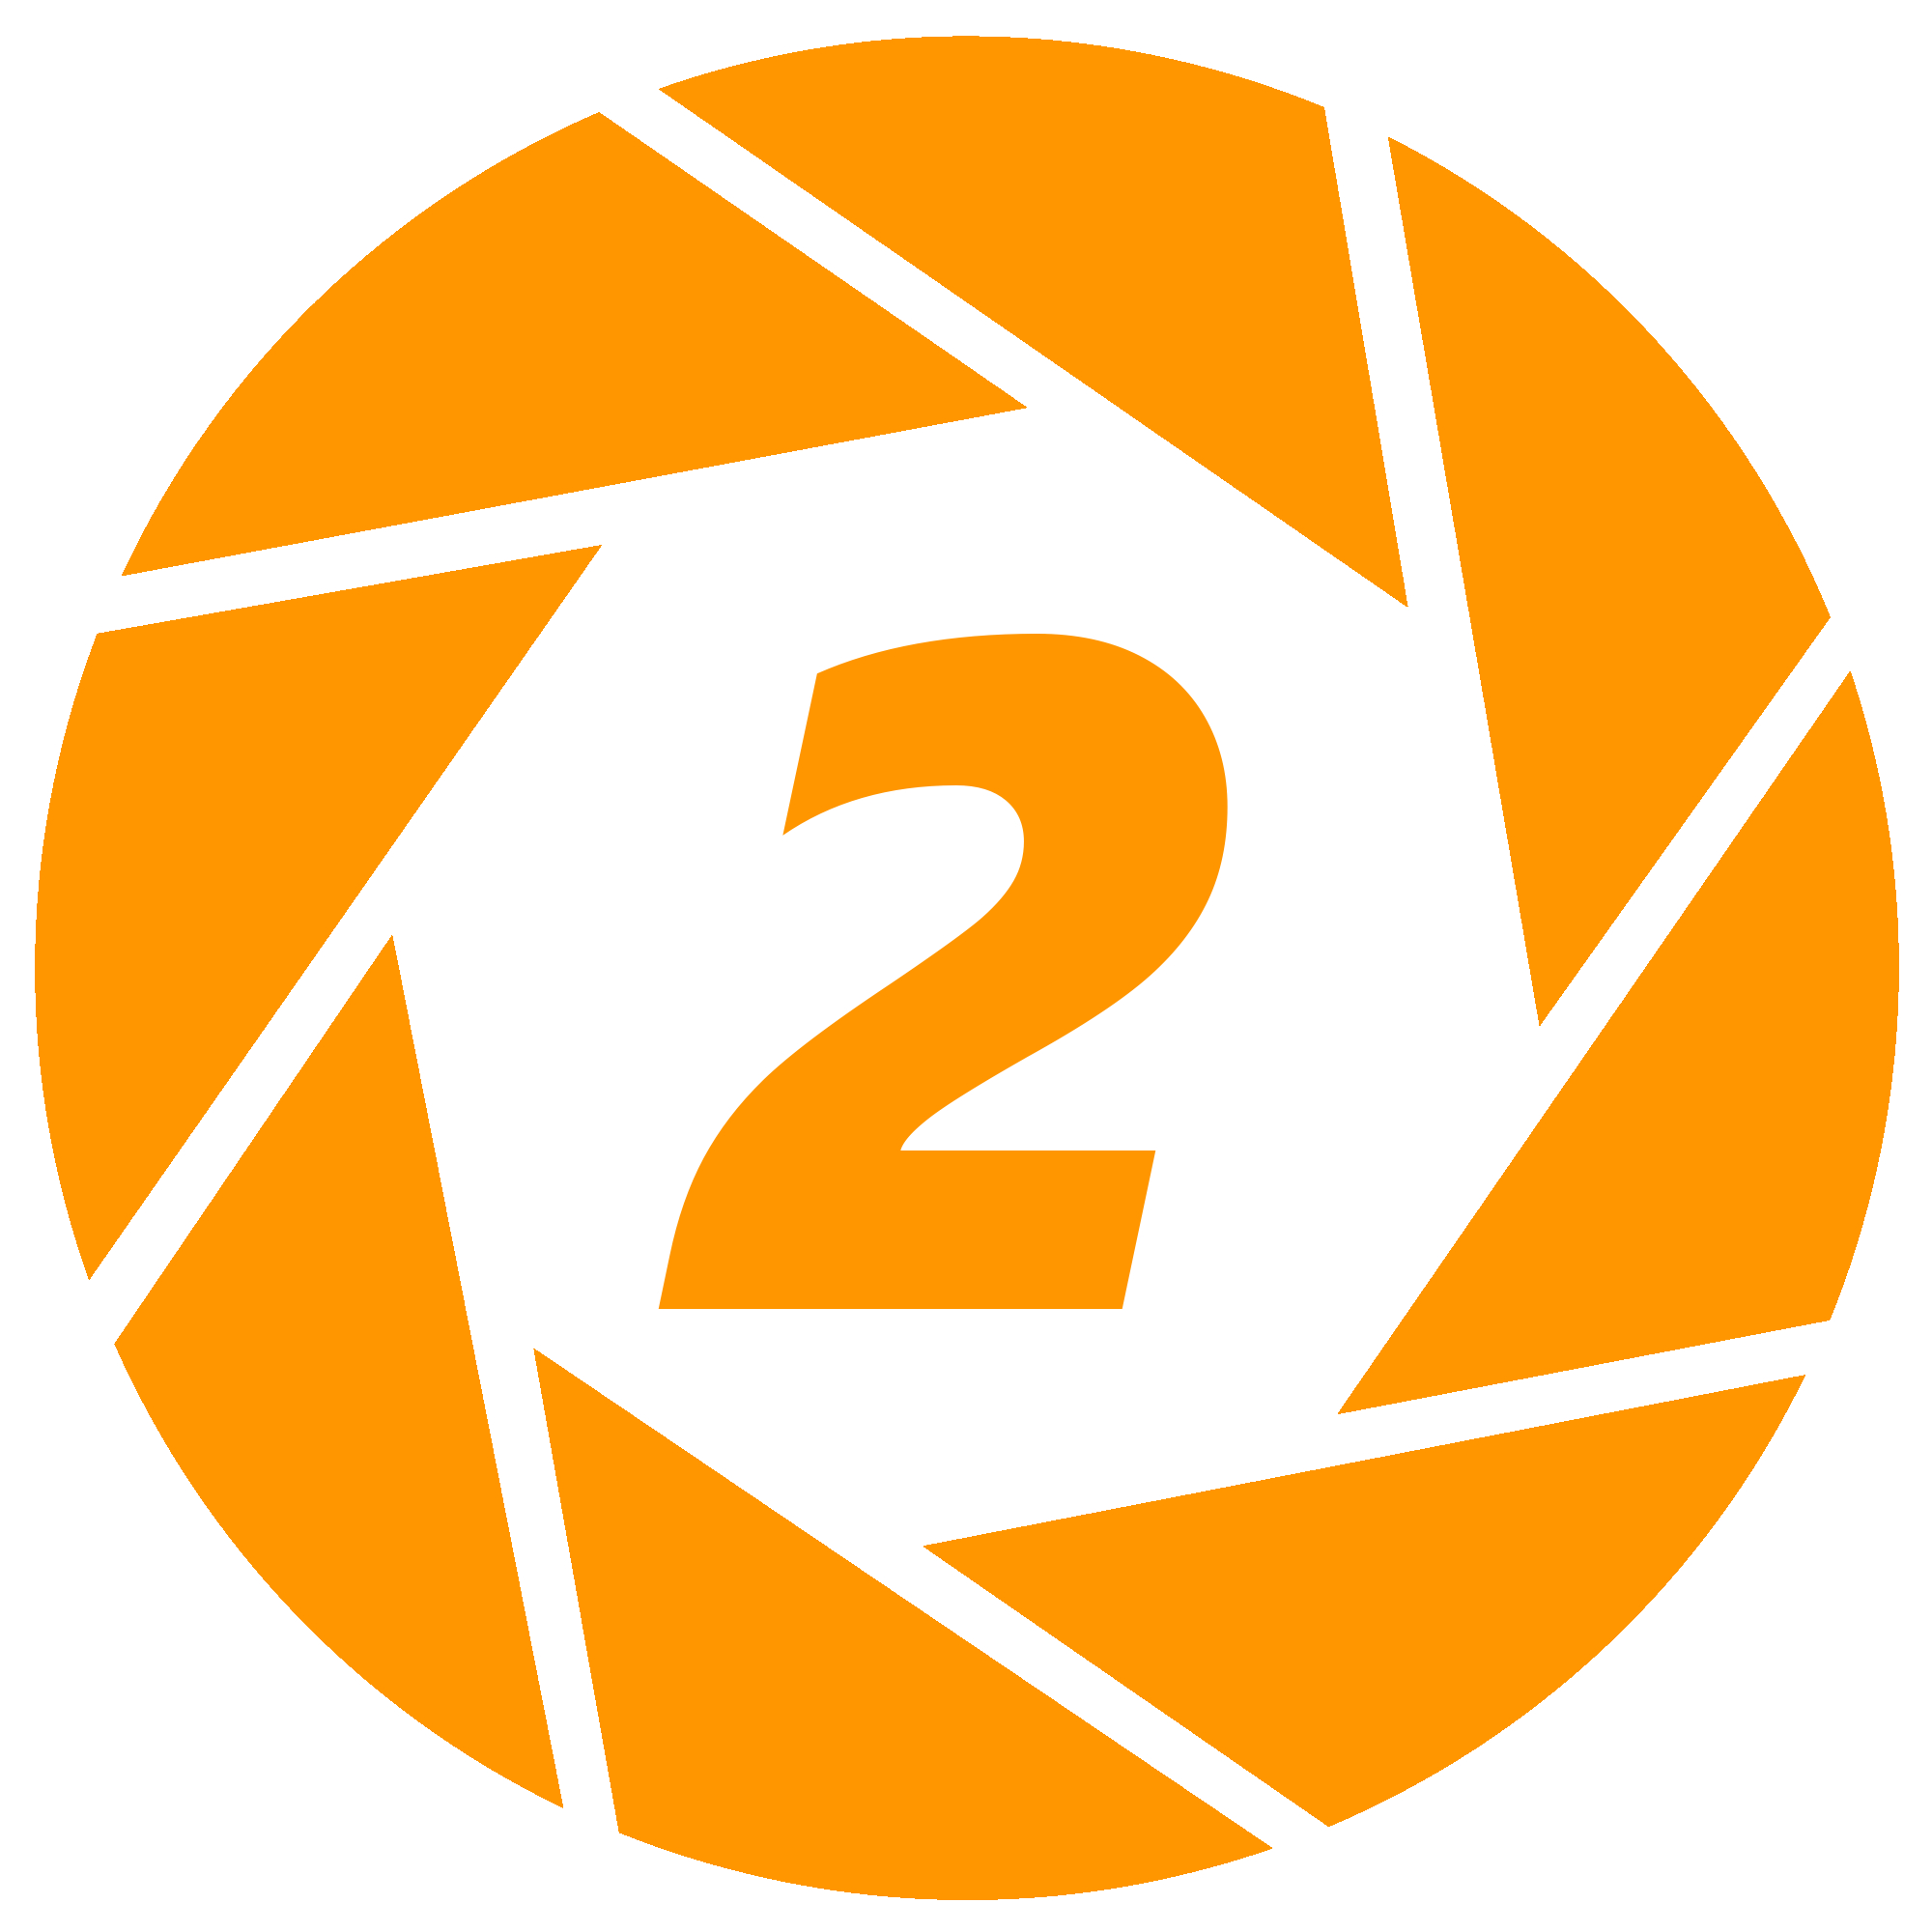 Aperture Science 2: A Cooperative Portal 2 Mod - Mod DB